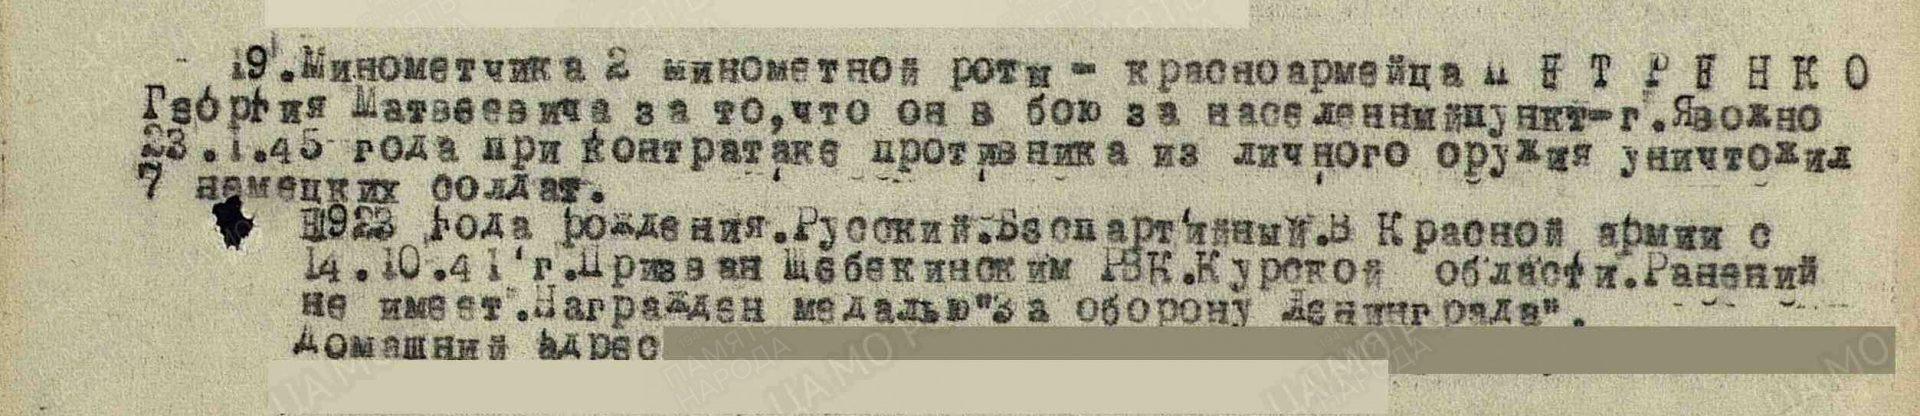 Петренко Георгий Матвеевич